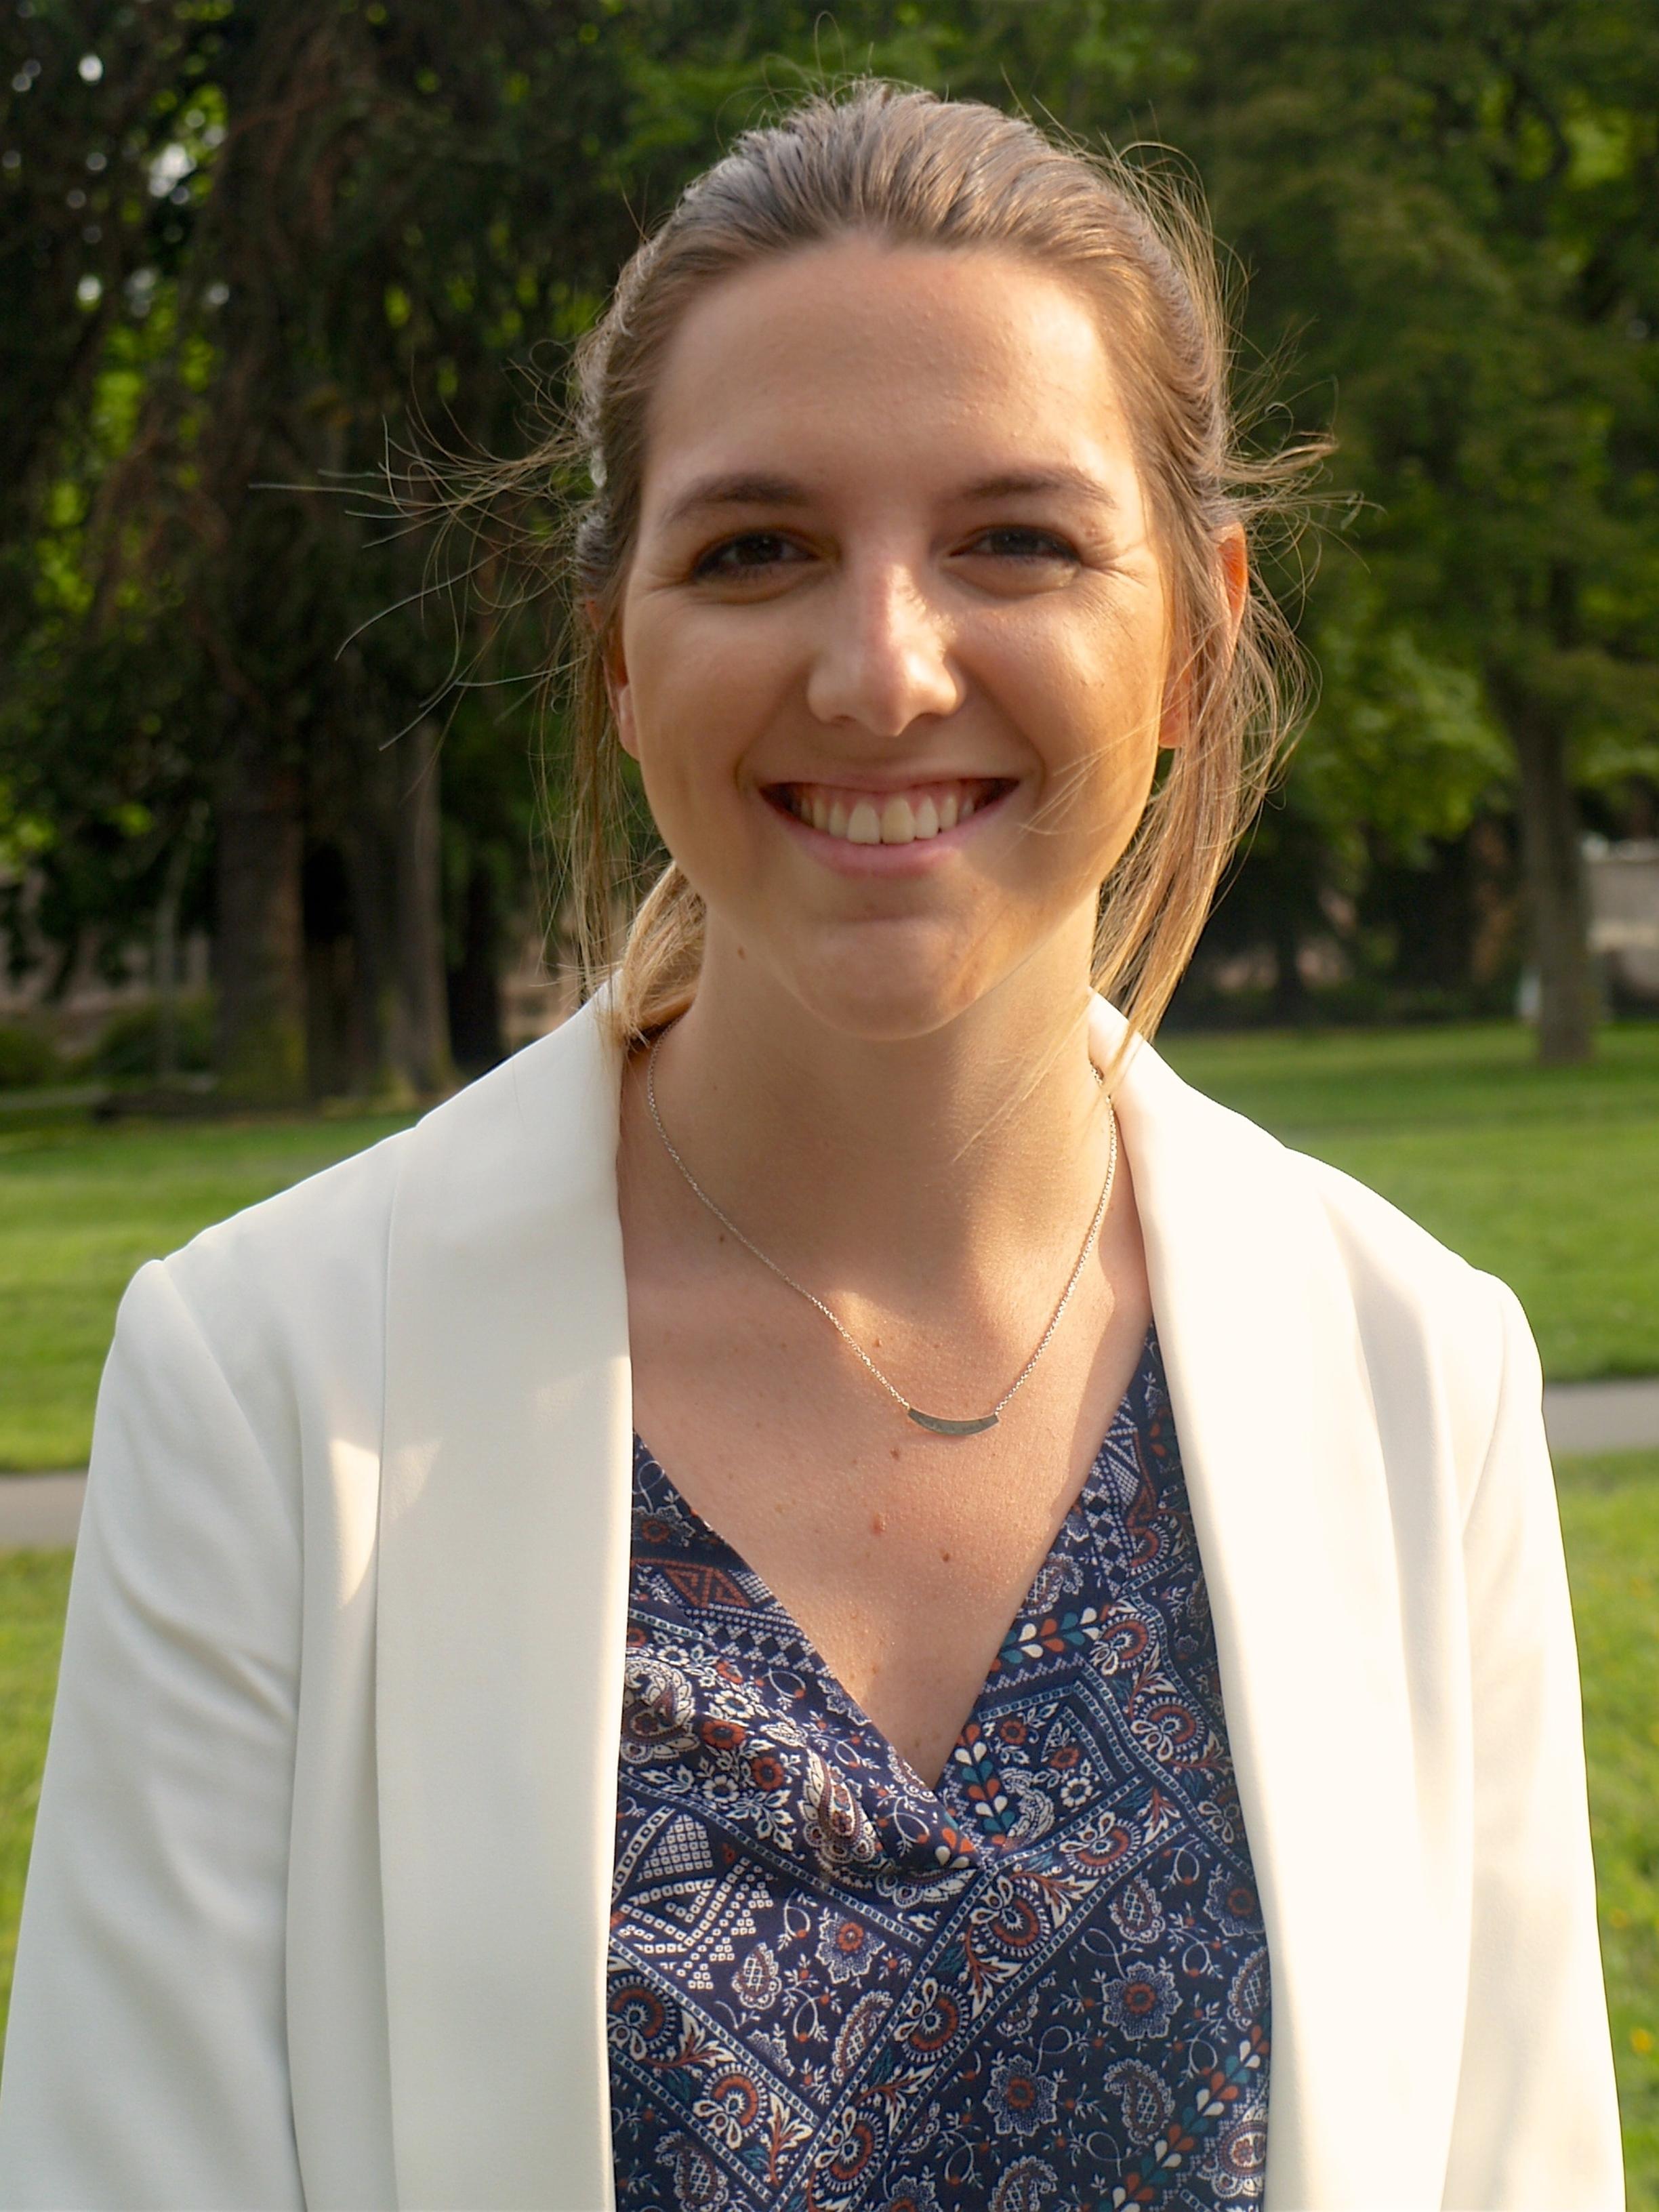 Ana Sabarots